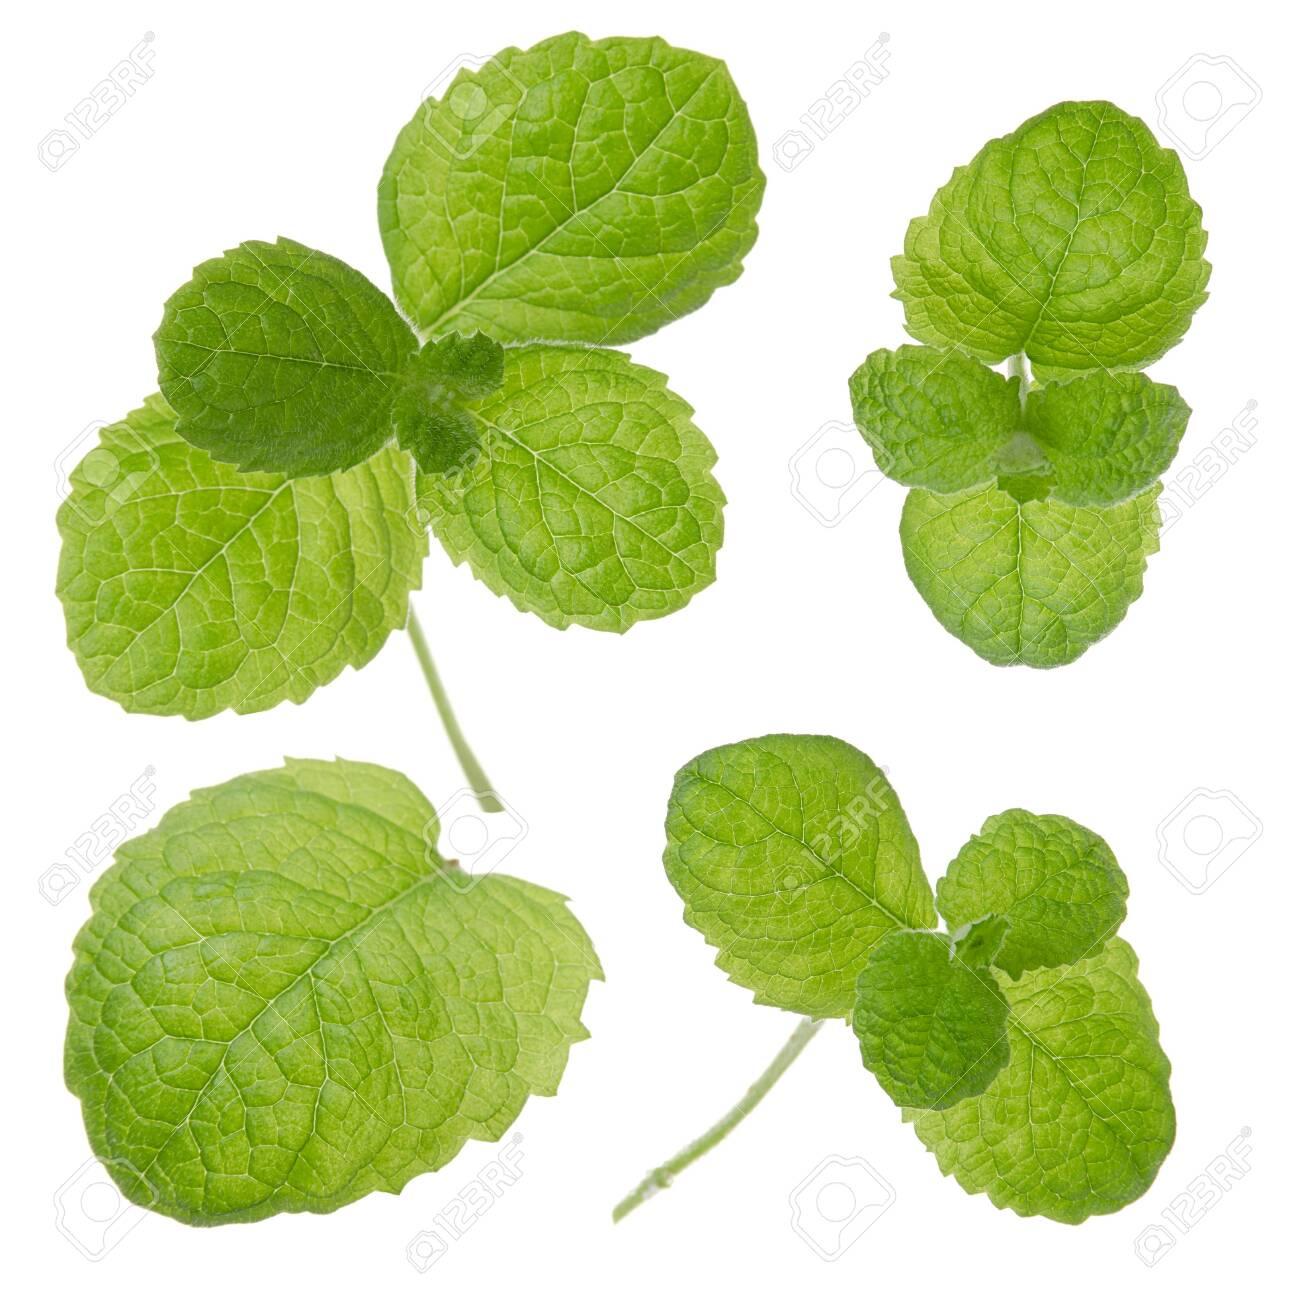 Mint fresh green leaf set isolated on white background - 139927564